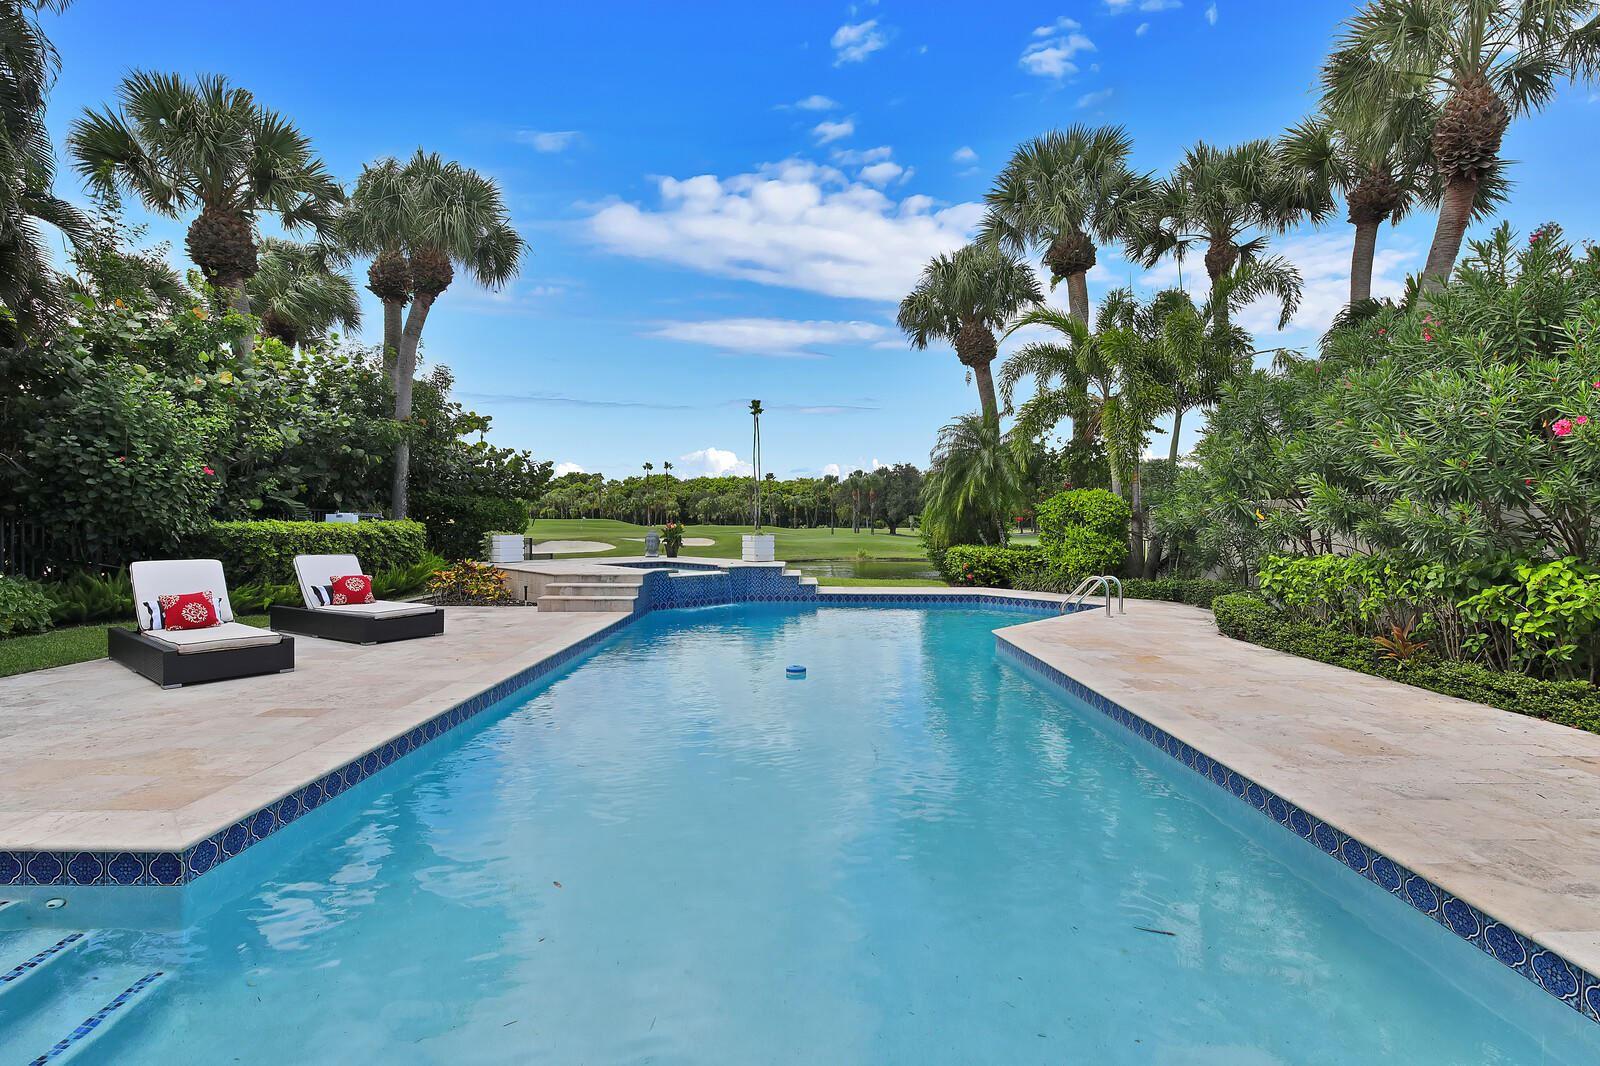 Photo of 13337 Provence Drive, Palm Beach Gardens, FL 33410 (MLS # RX-10650587)